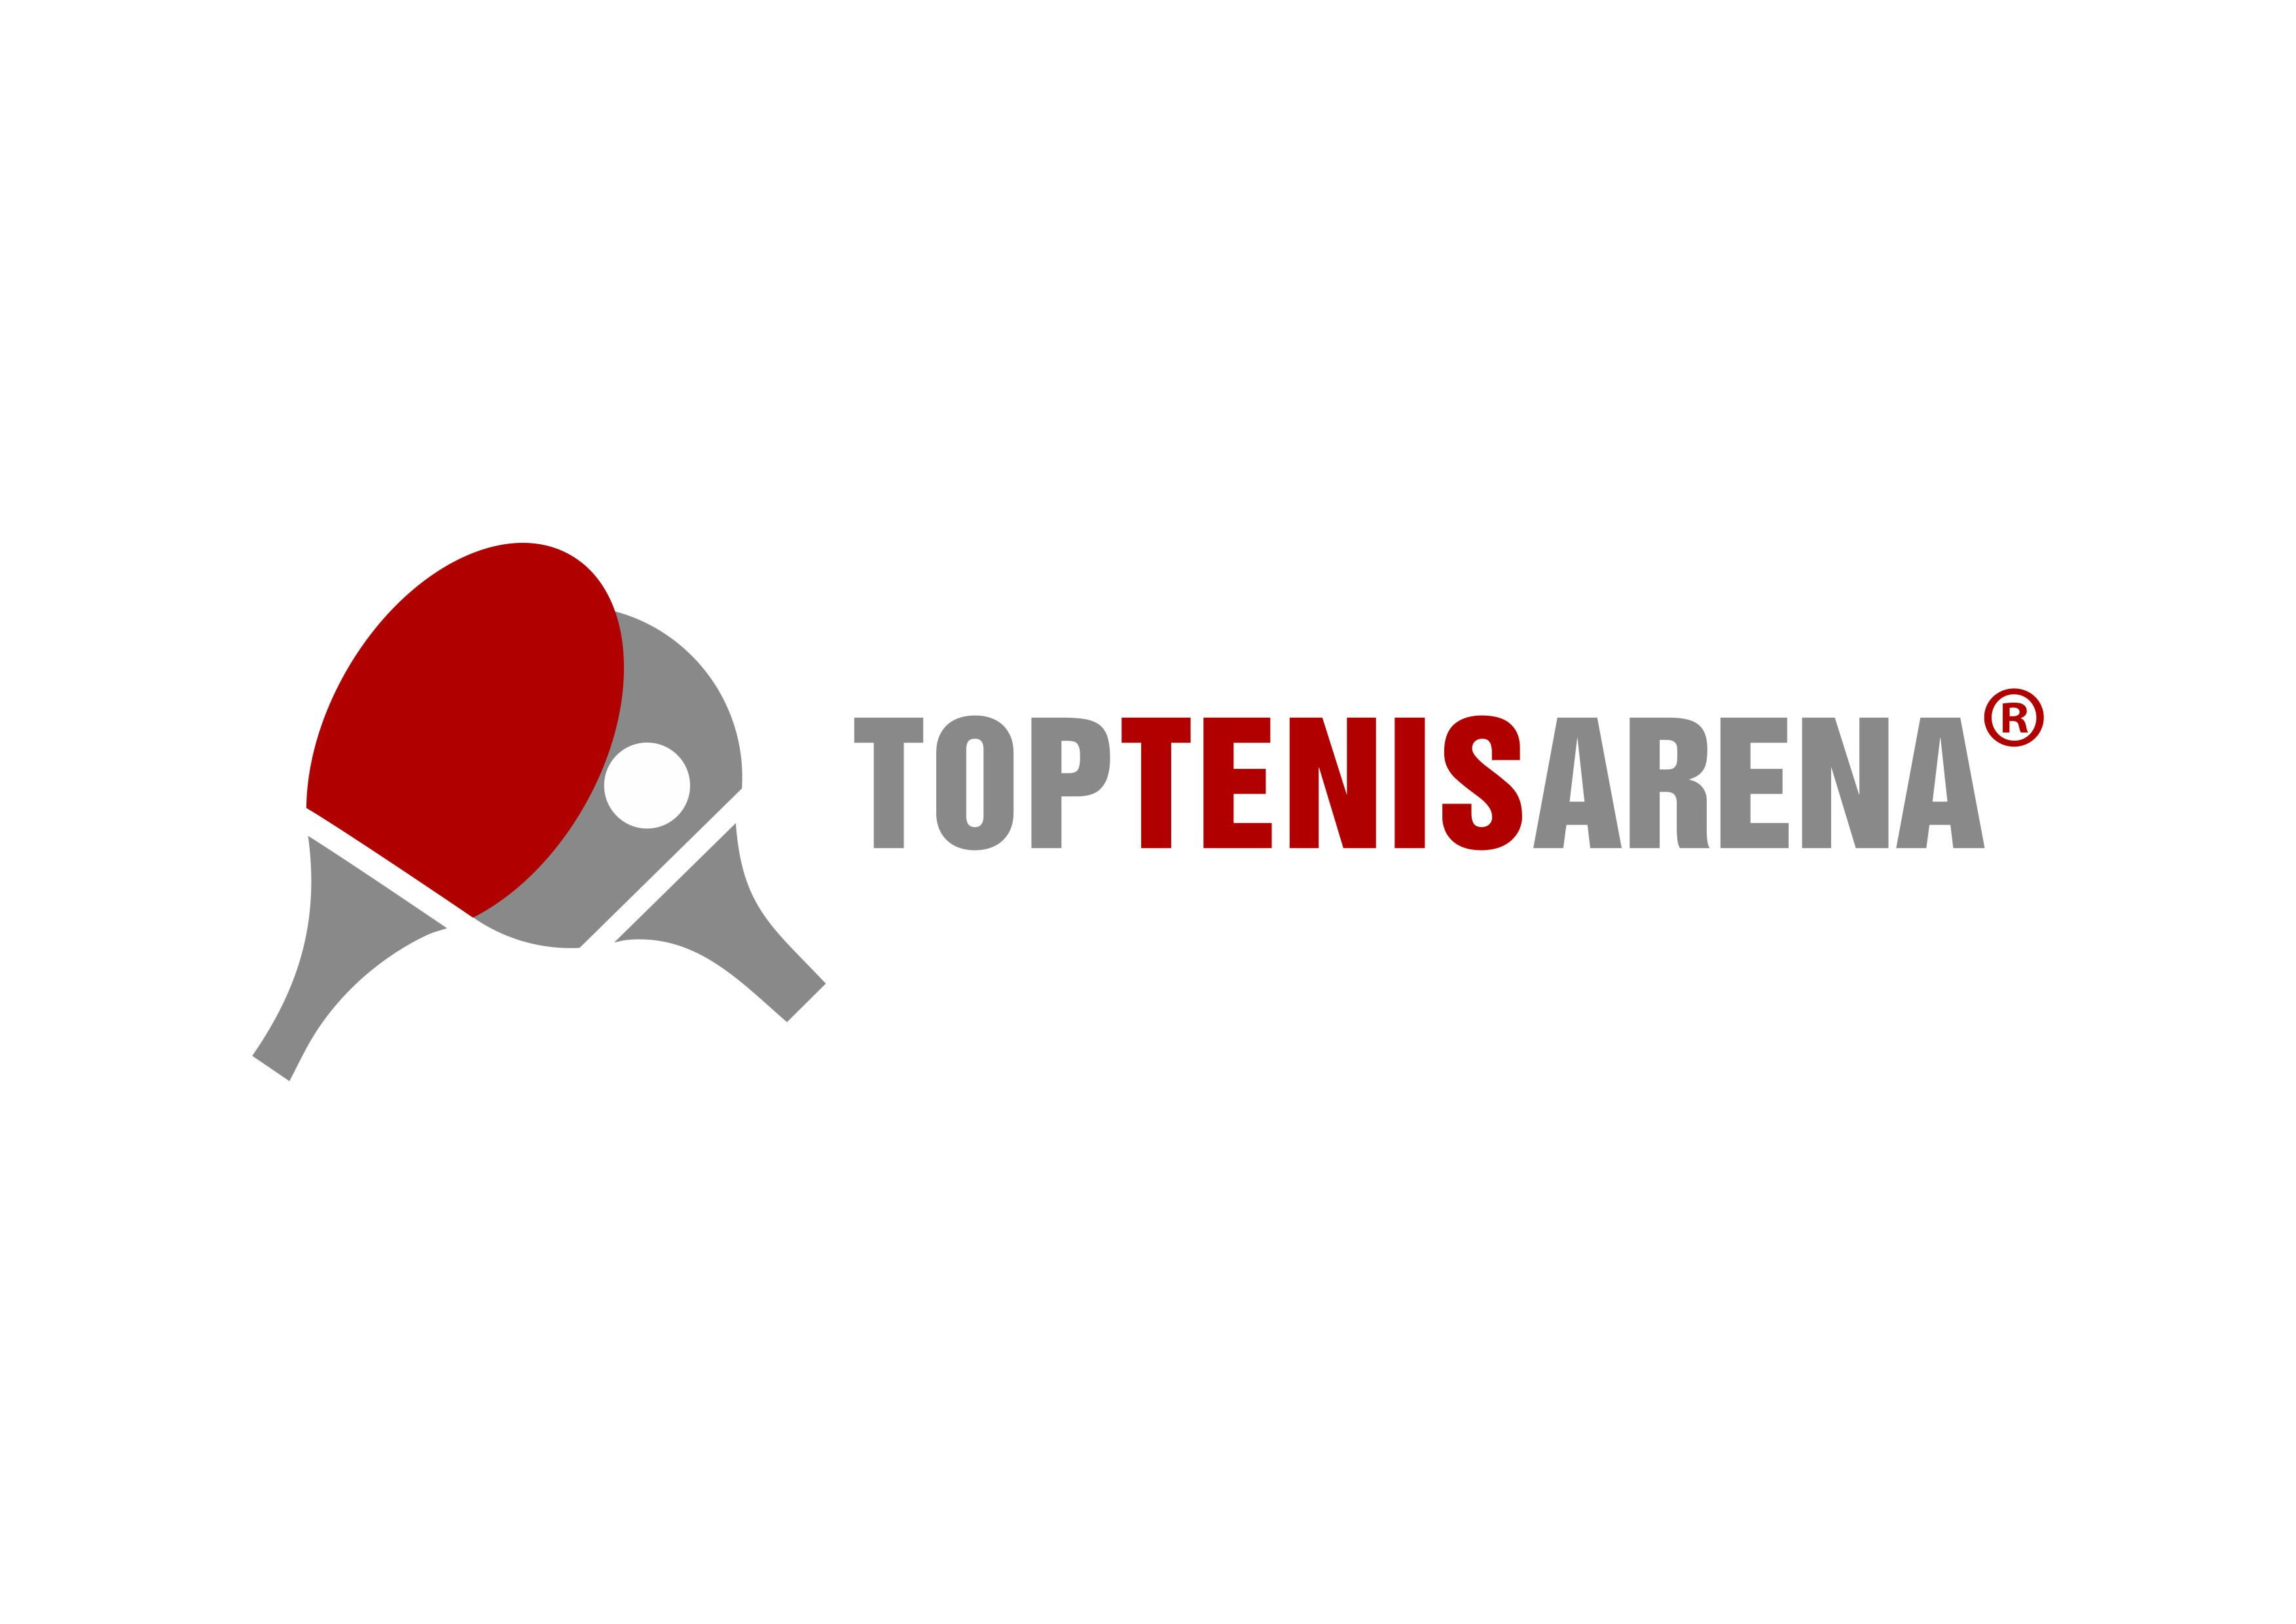 logo-top-tenis-arena